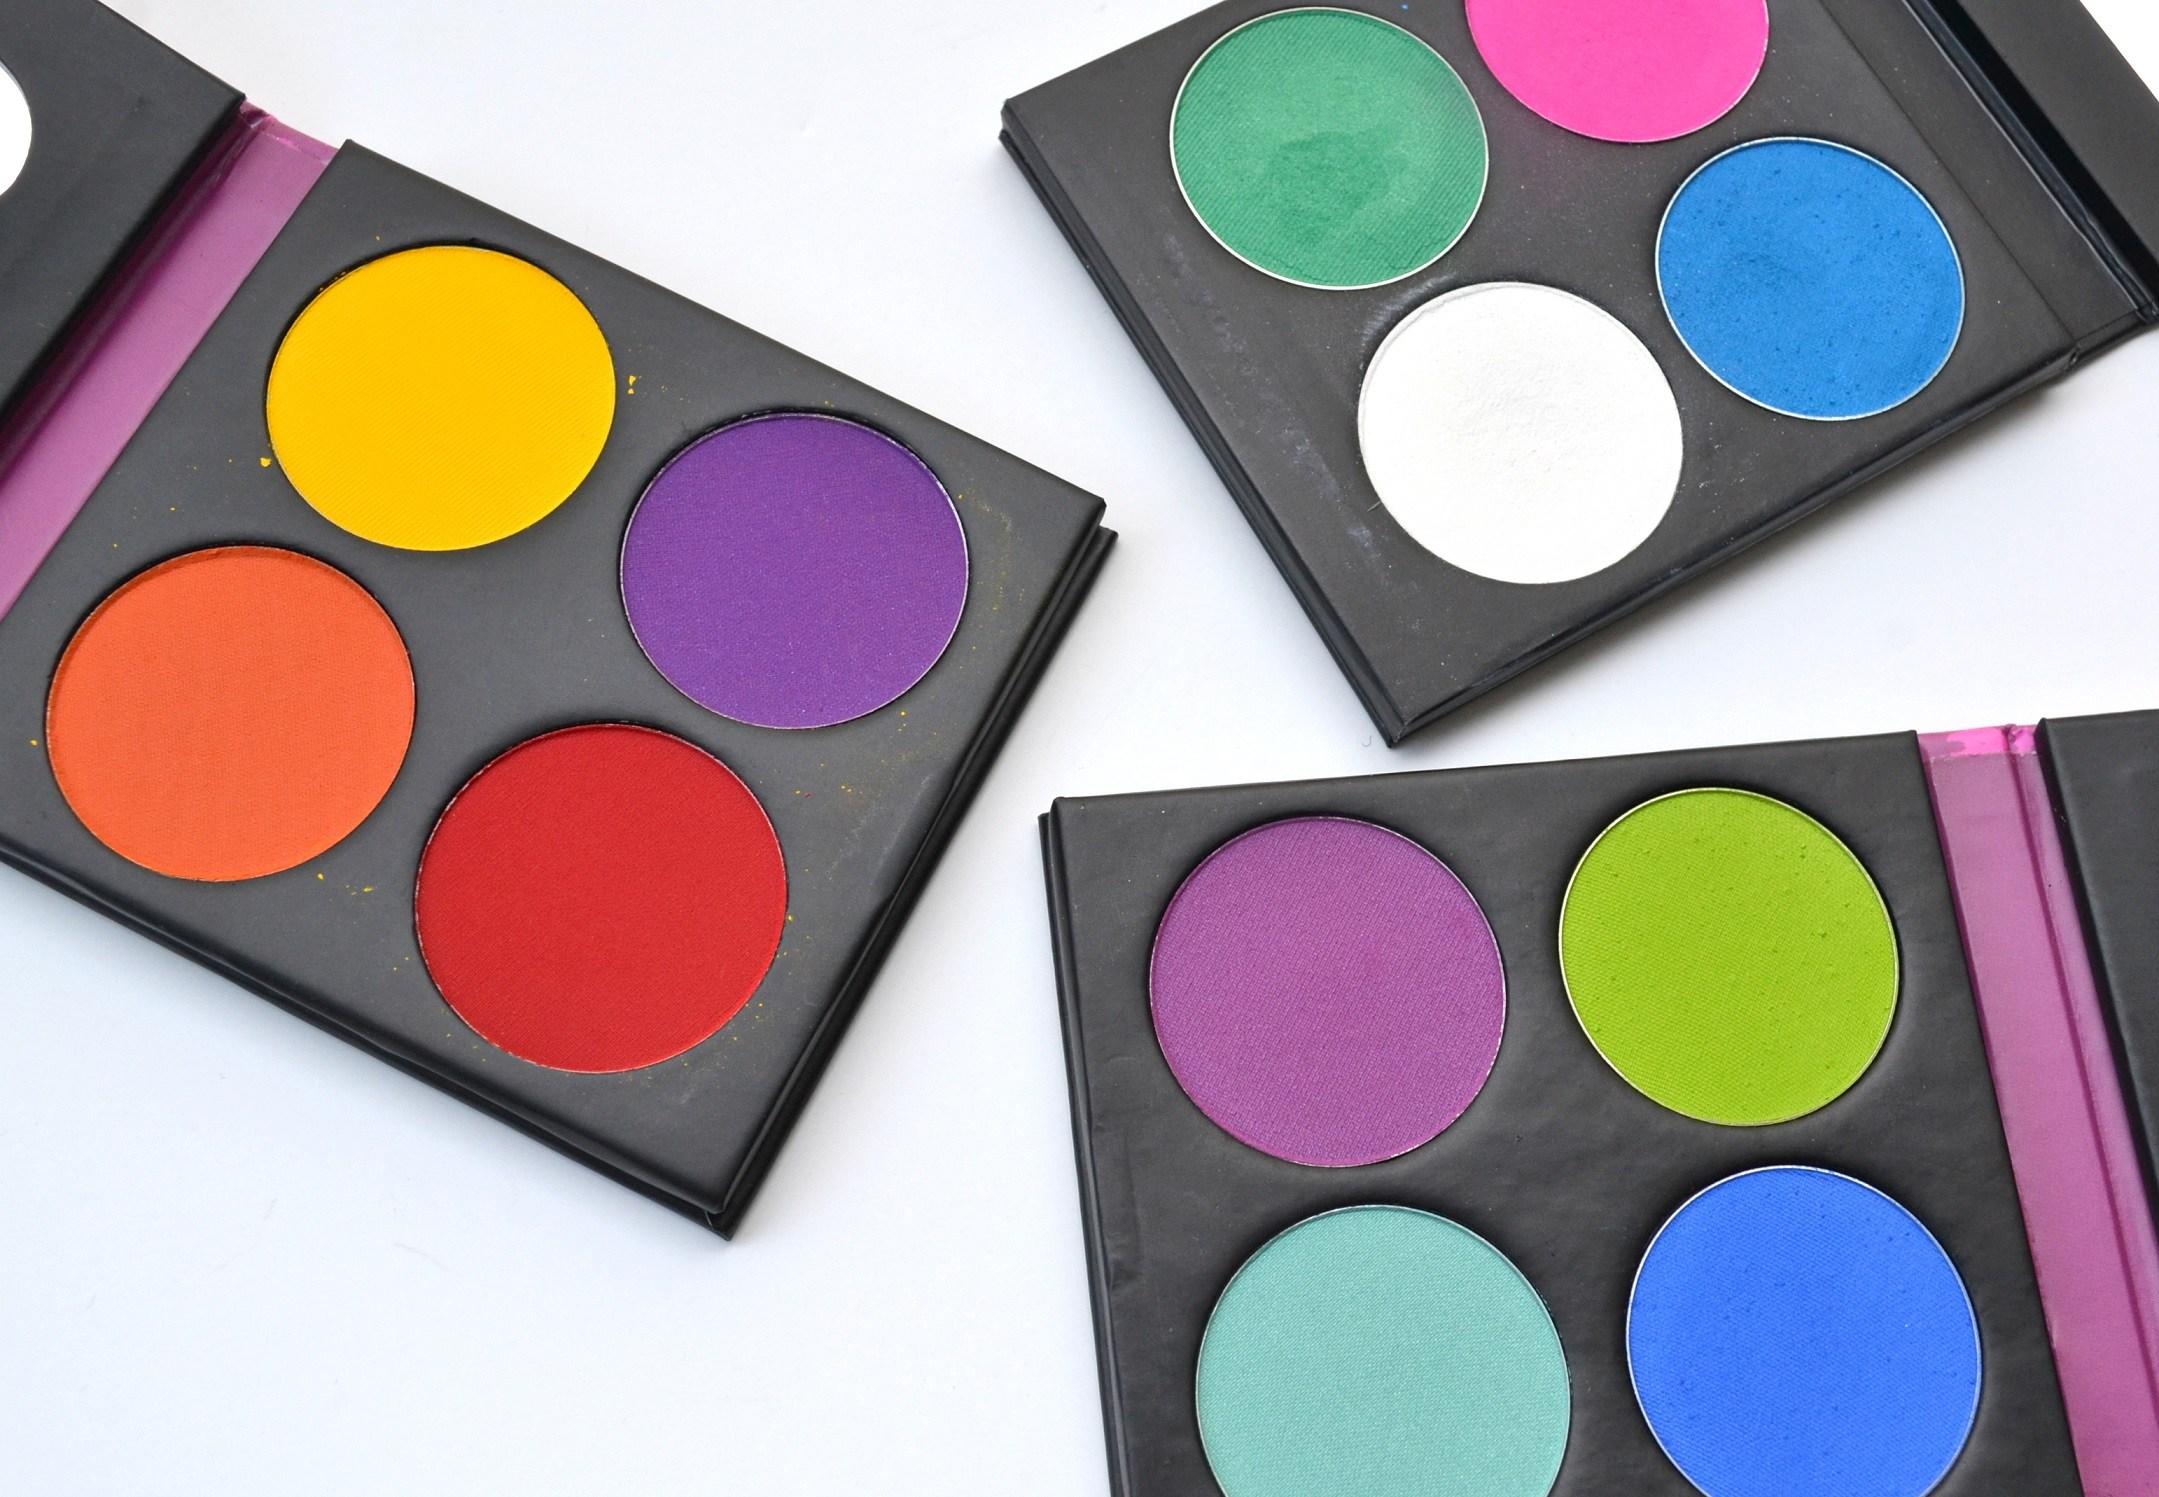 Sugarpill Makeup Palettes